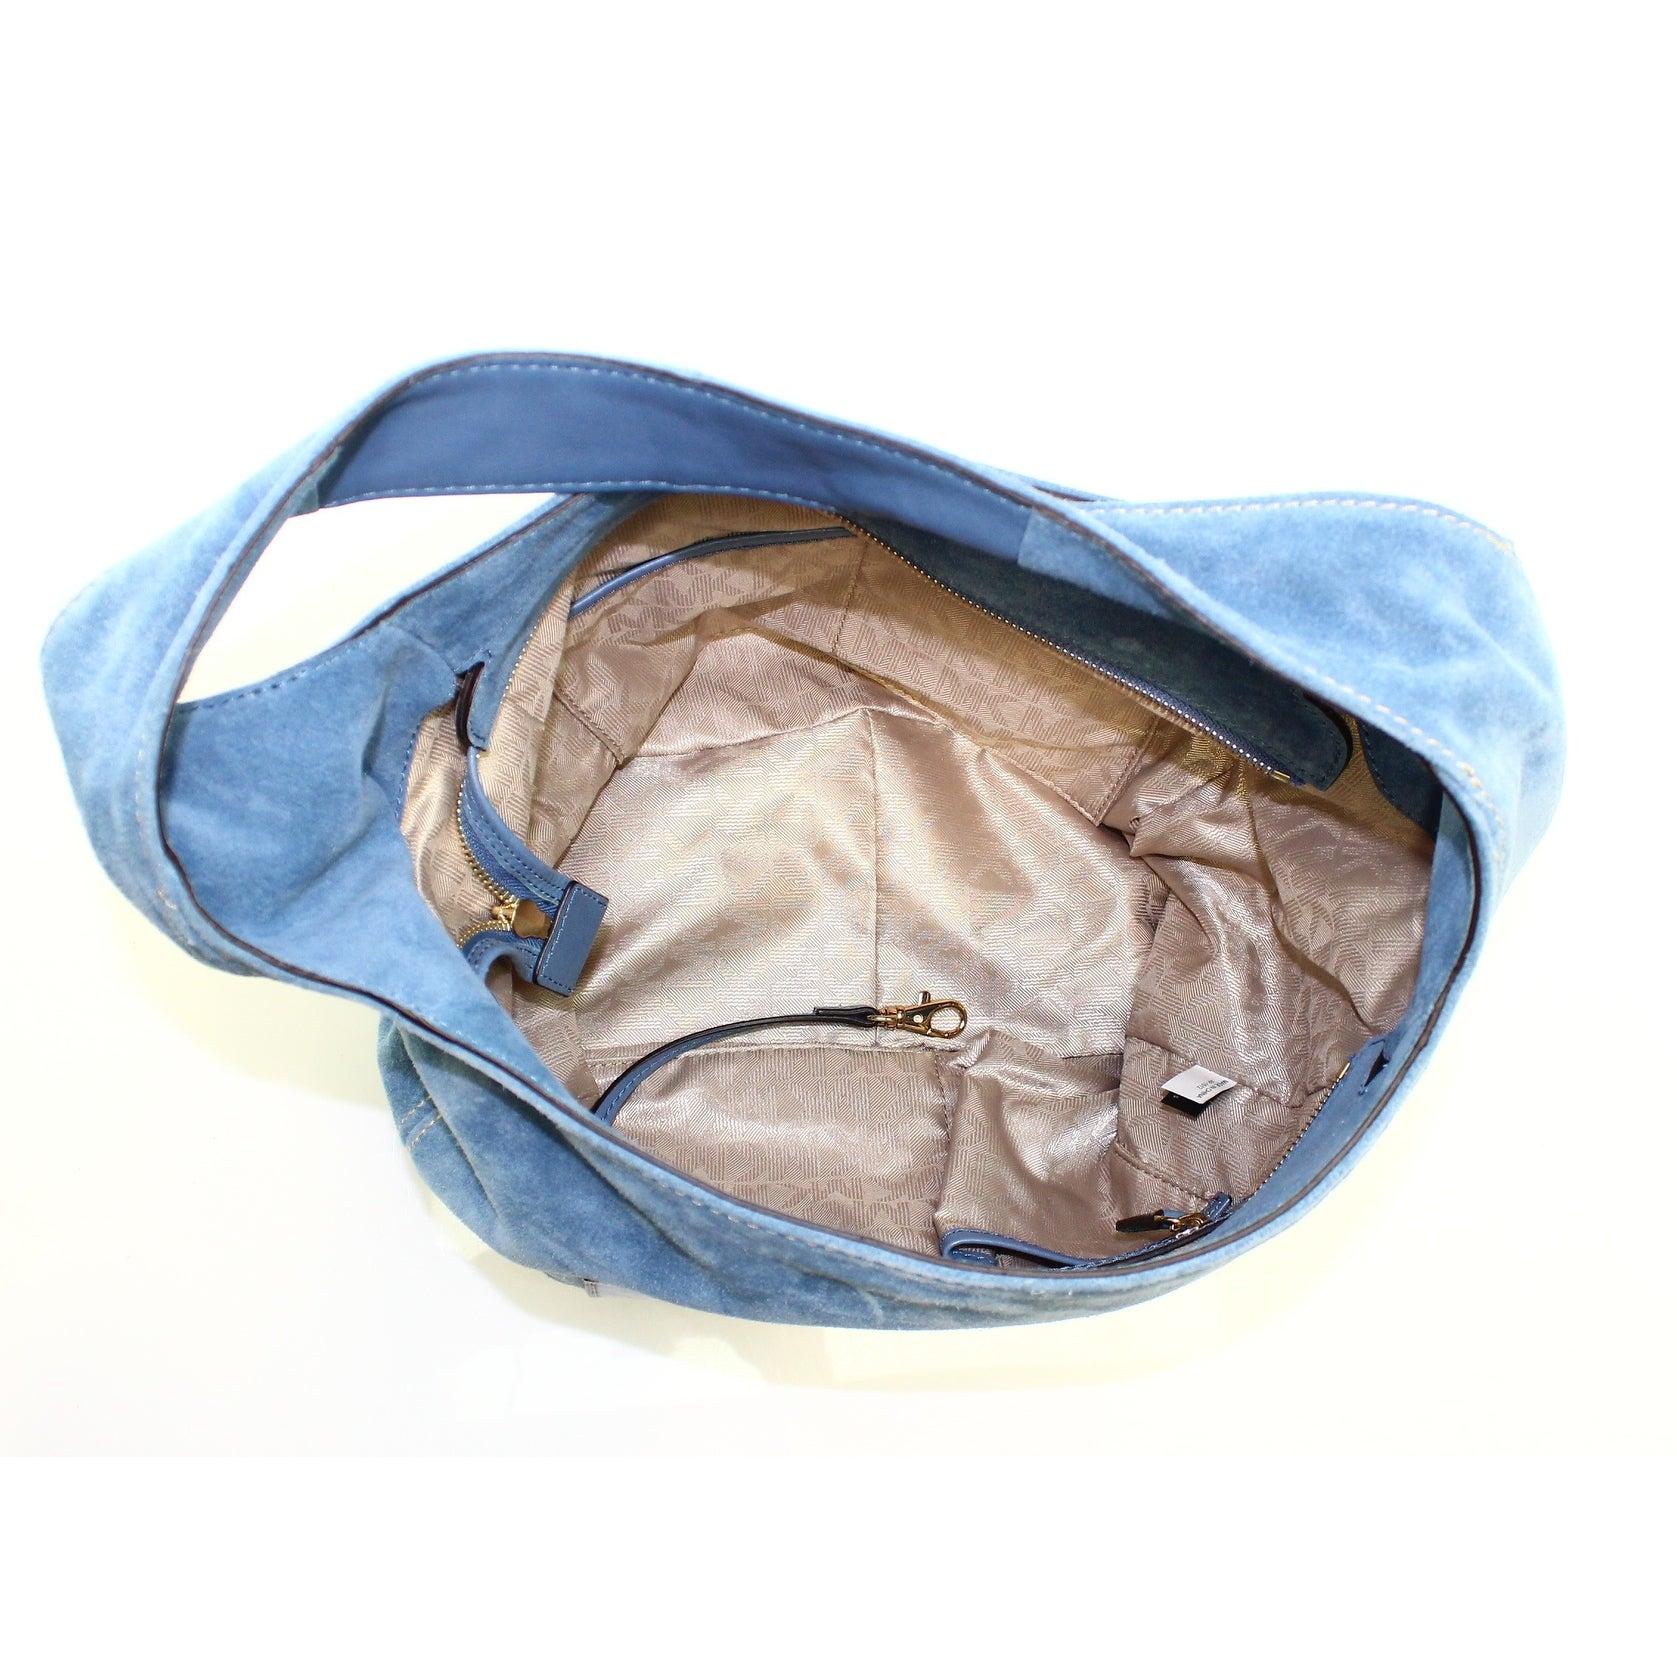 97827c617564 Shop Michael Kors NEW Blue Denim Suede Leather Lena Large Shoulder Bag Purse  - Free Shipping Today - Overstock - 16358640